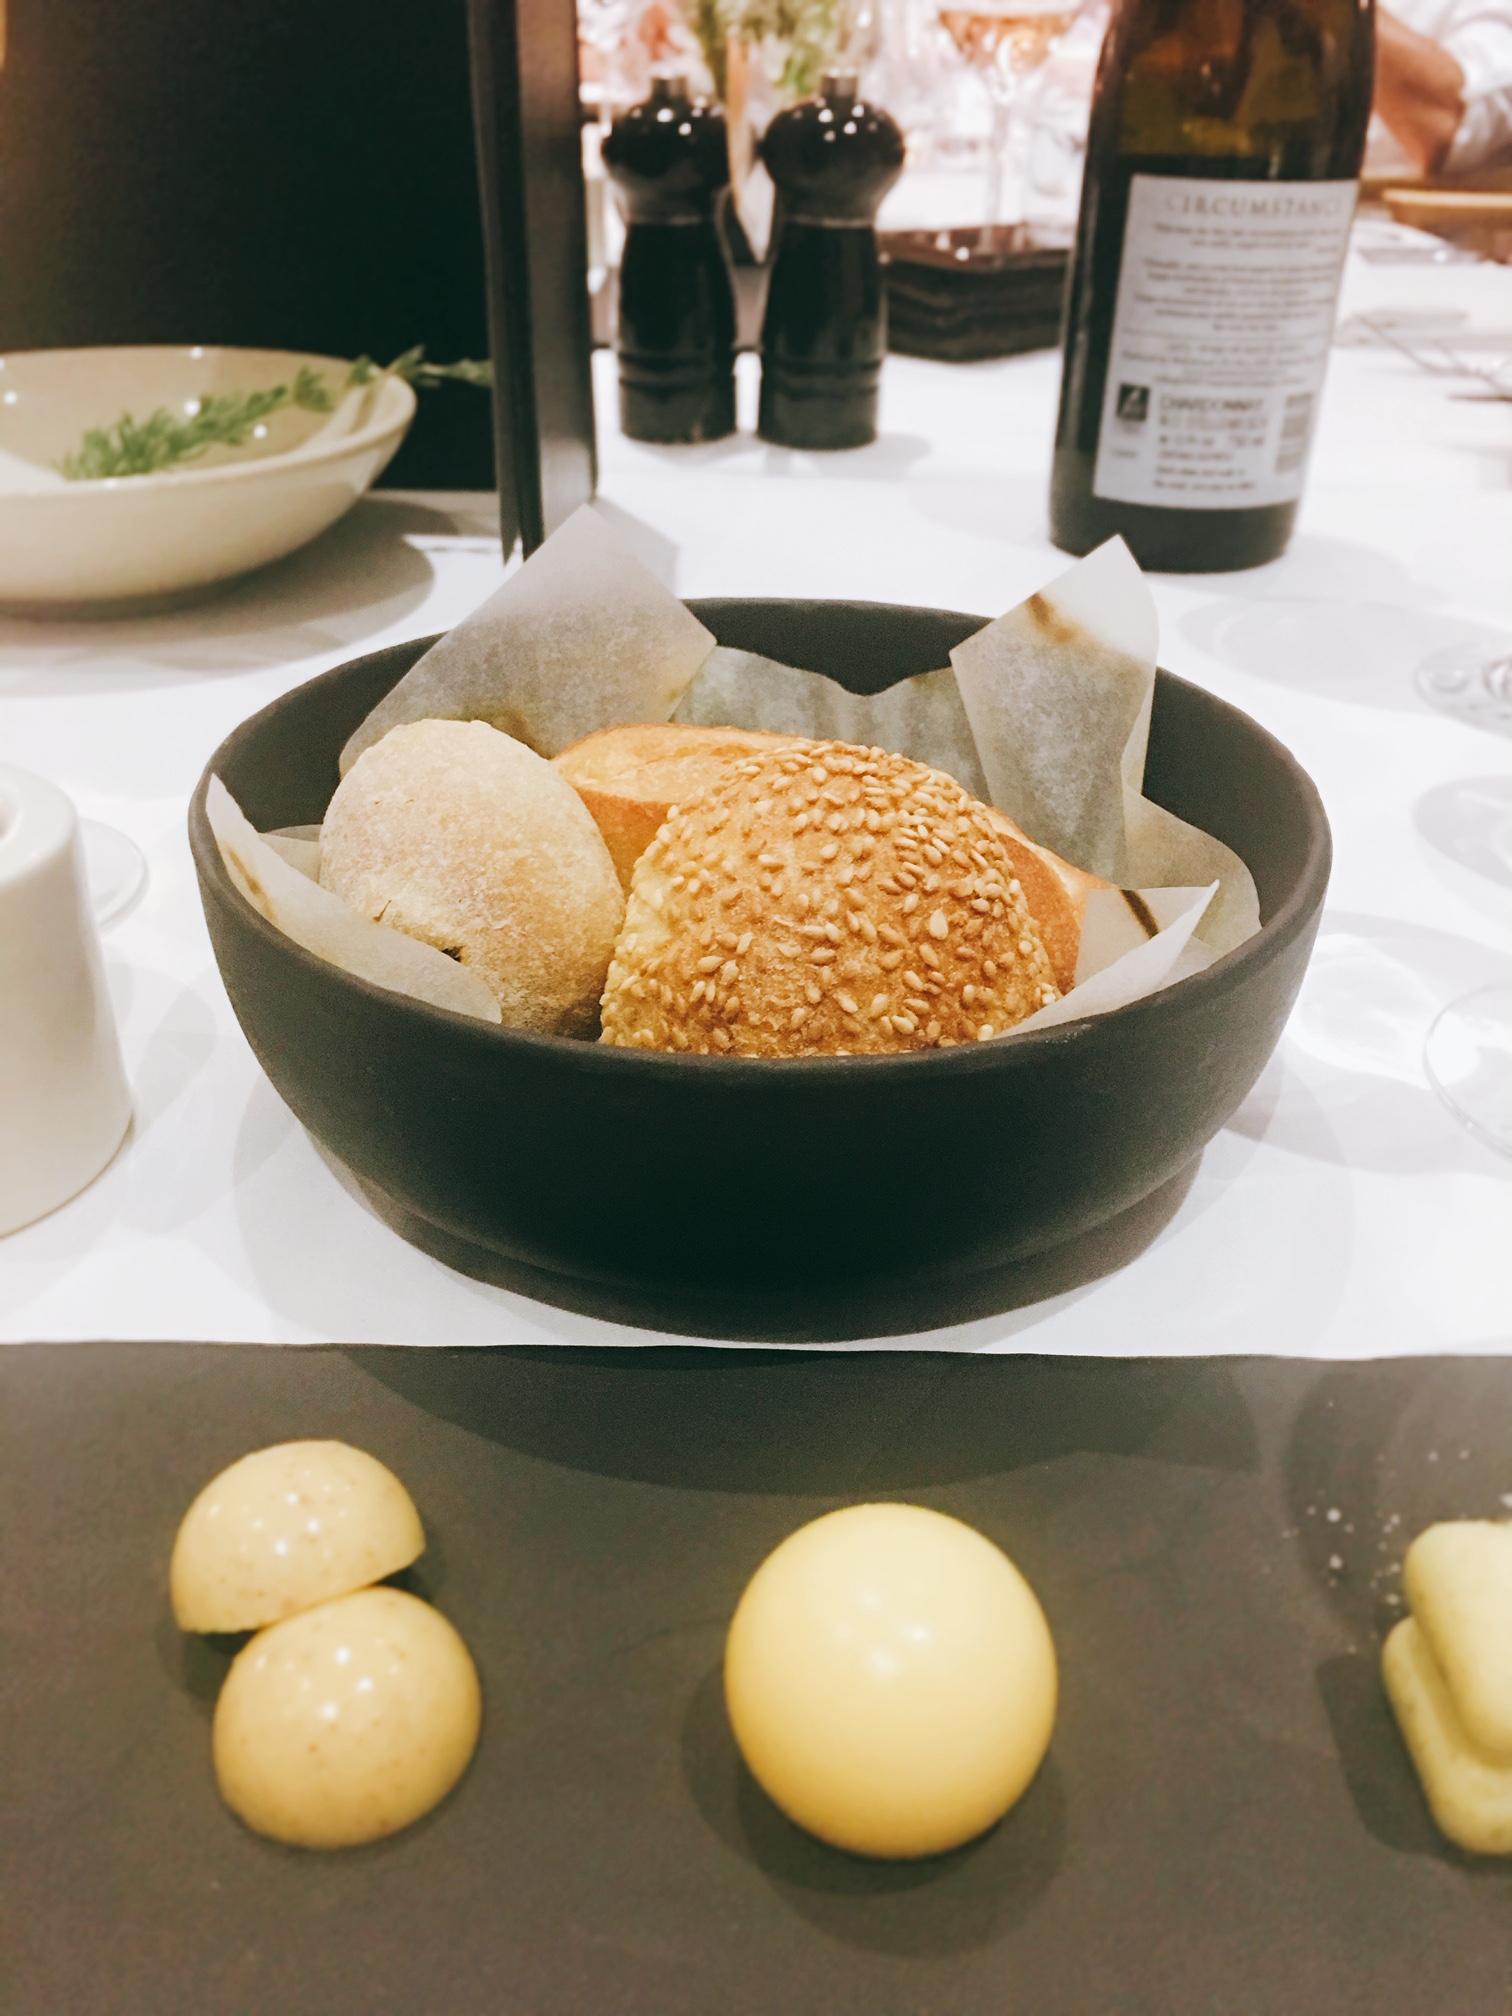 bread-coursekaylin-pieterse-exam